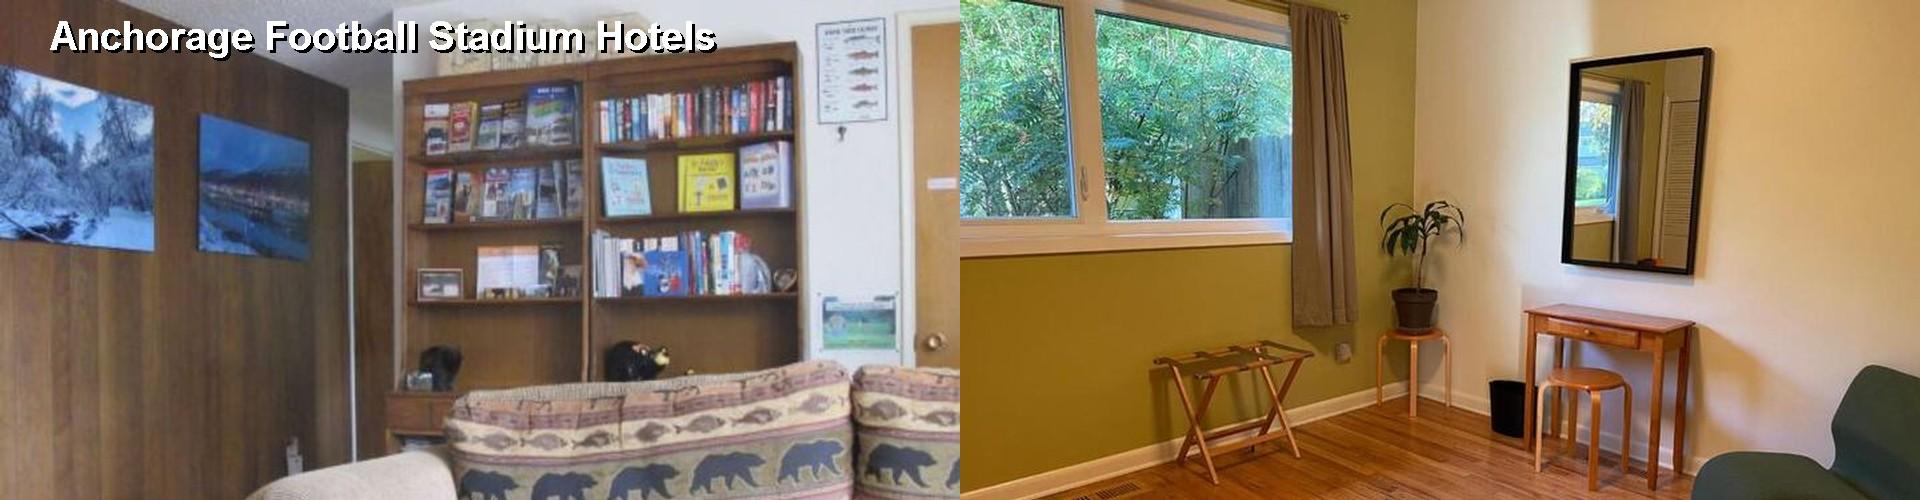 5 Best Hotels Near Anchorage Football Stadium